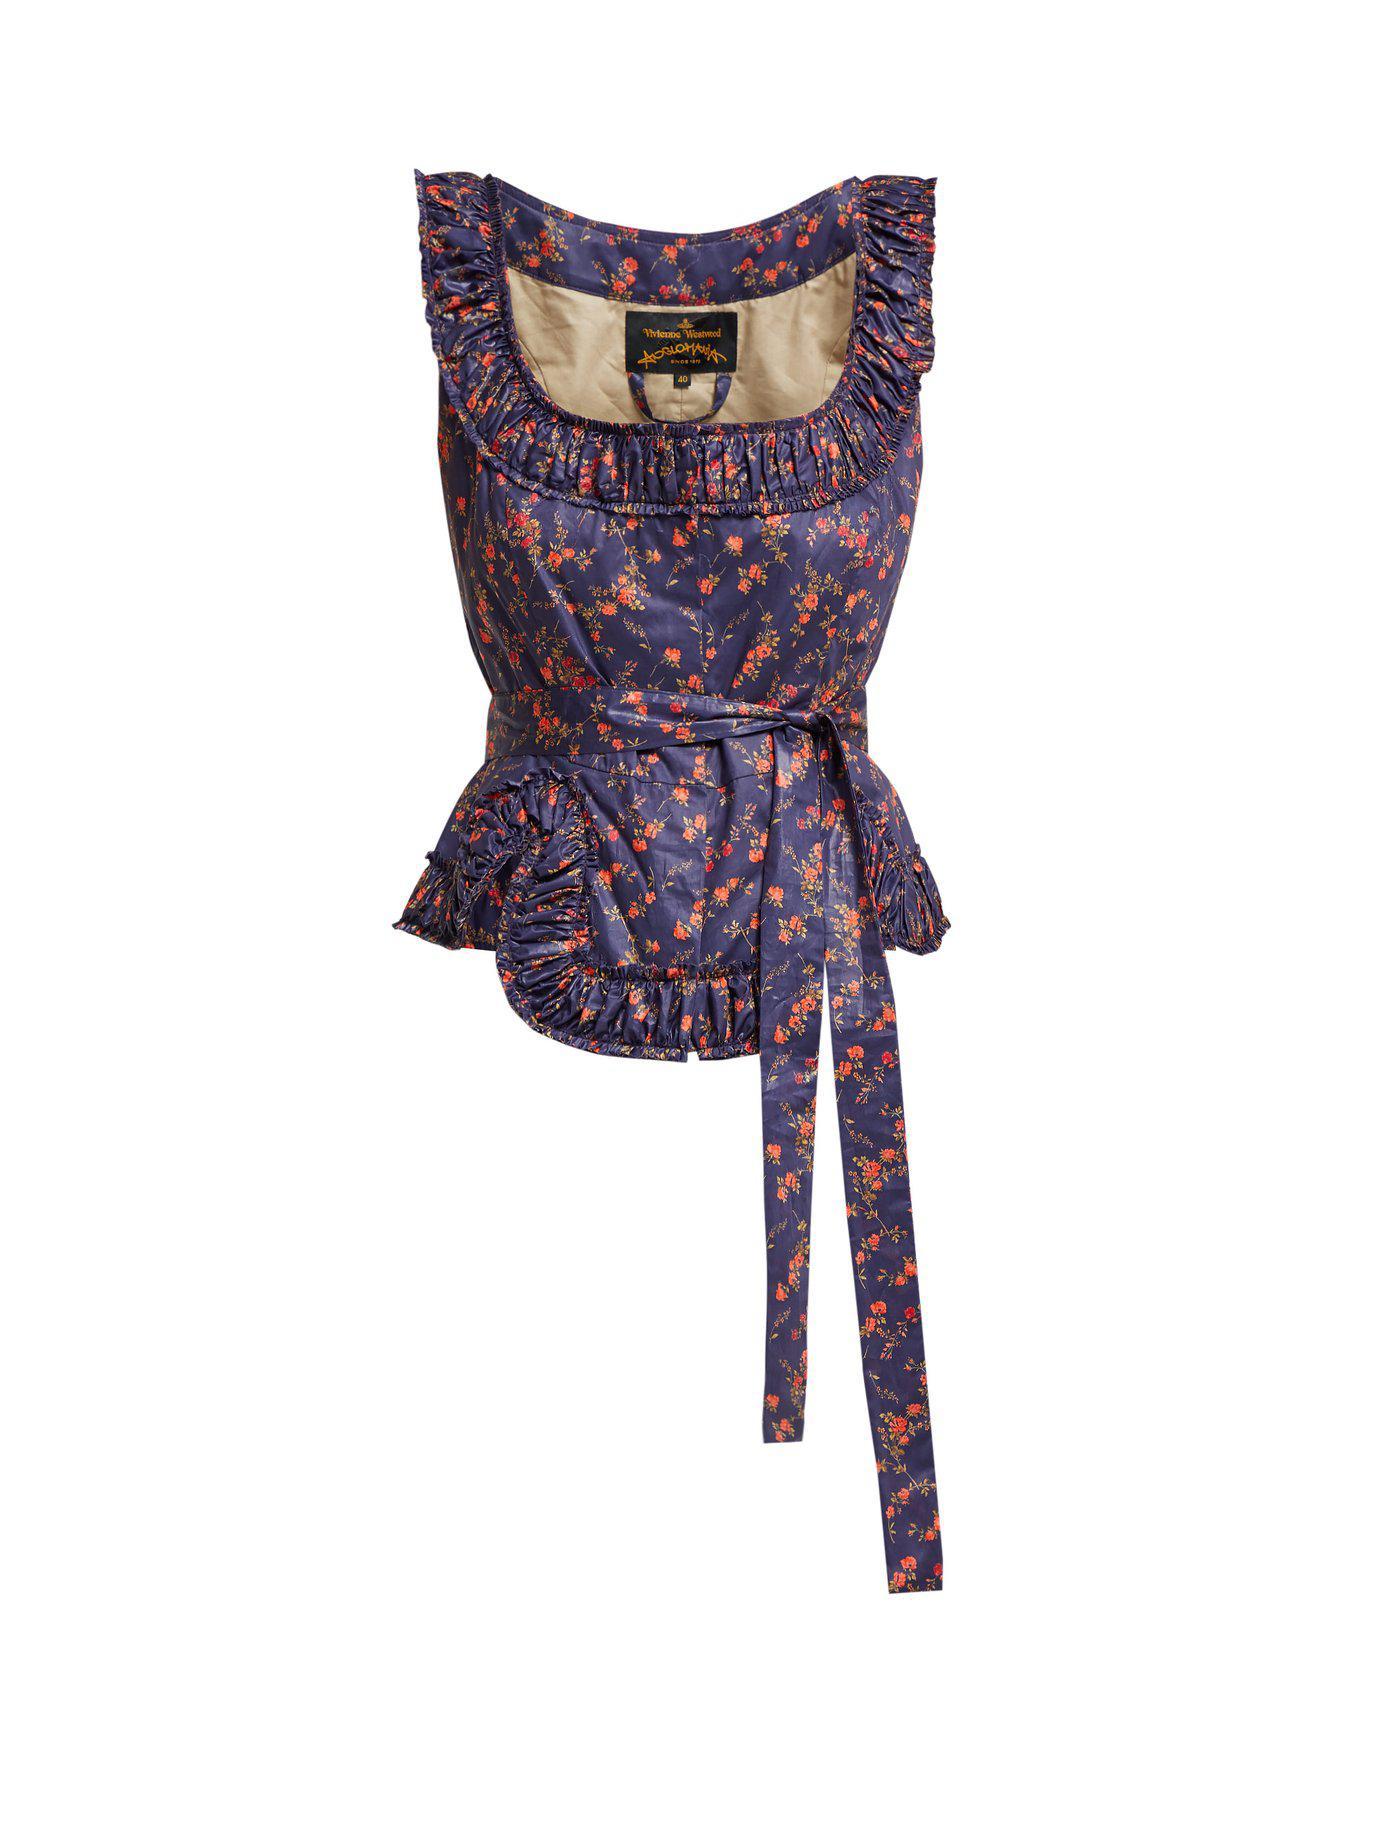 Lyst - Vivienne Westwood Anglomania Revolution Floral Print Cotton ... 2596697ca